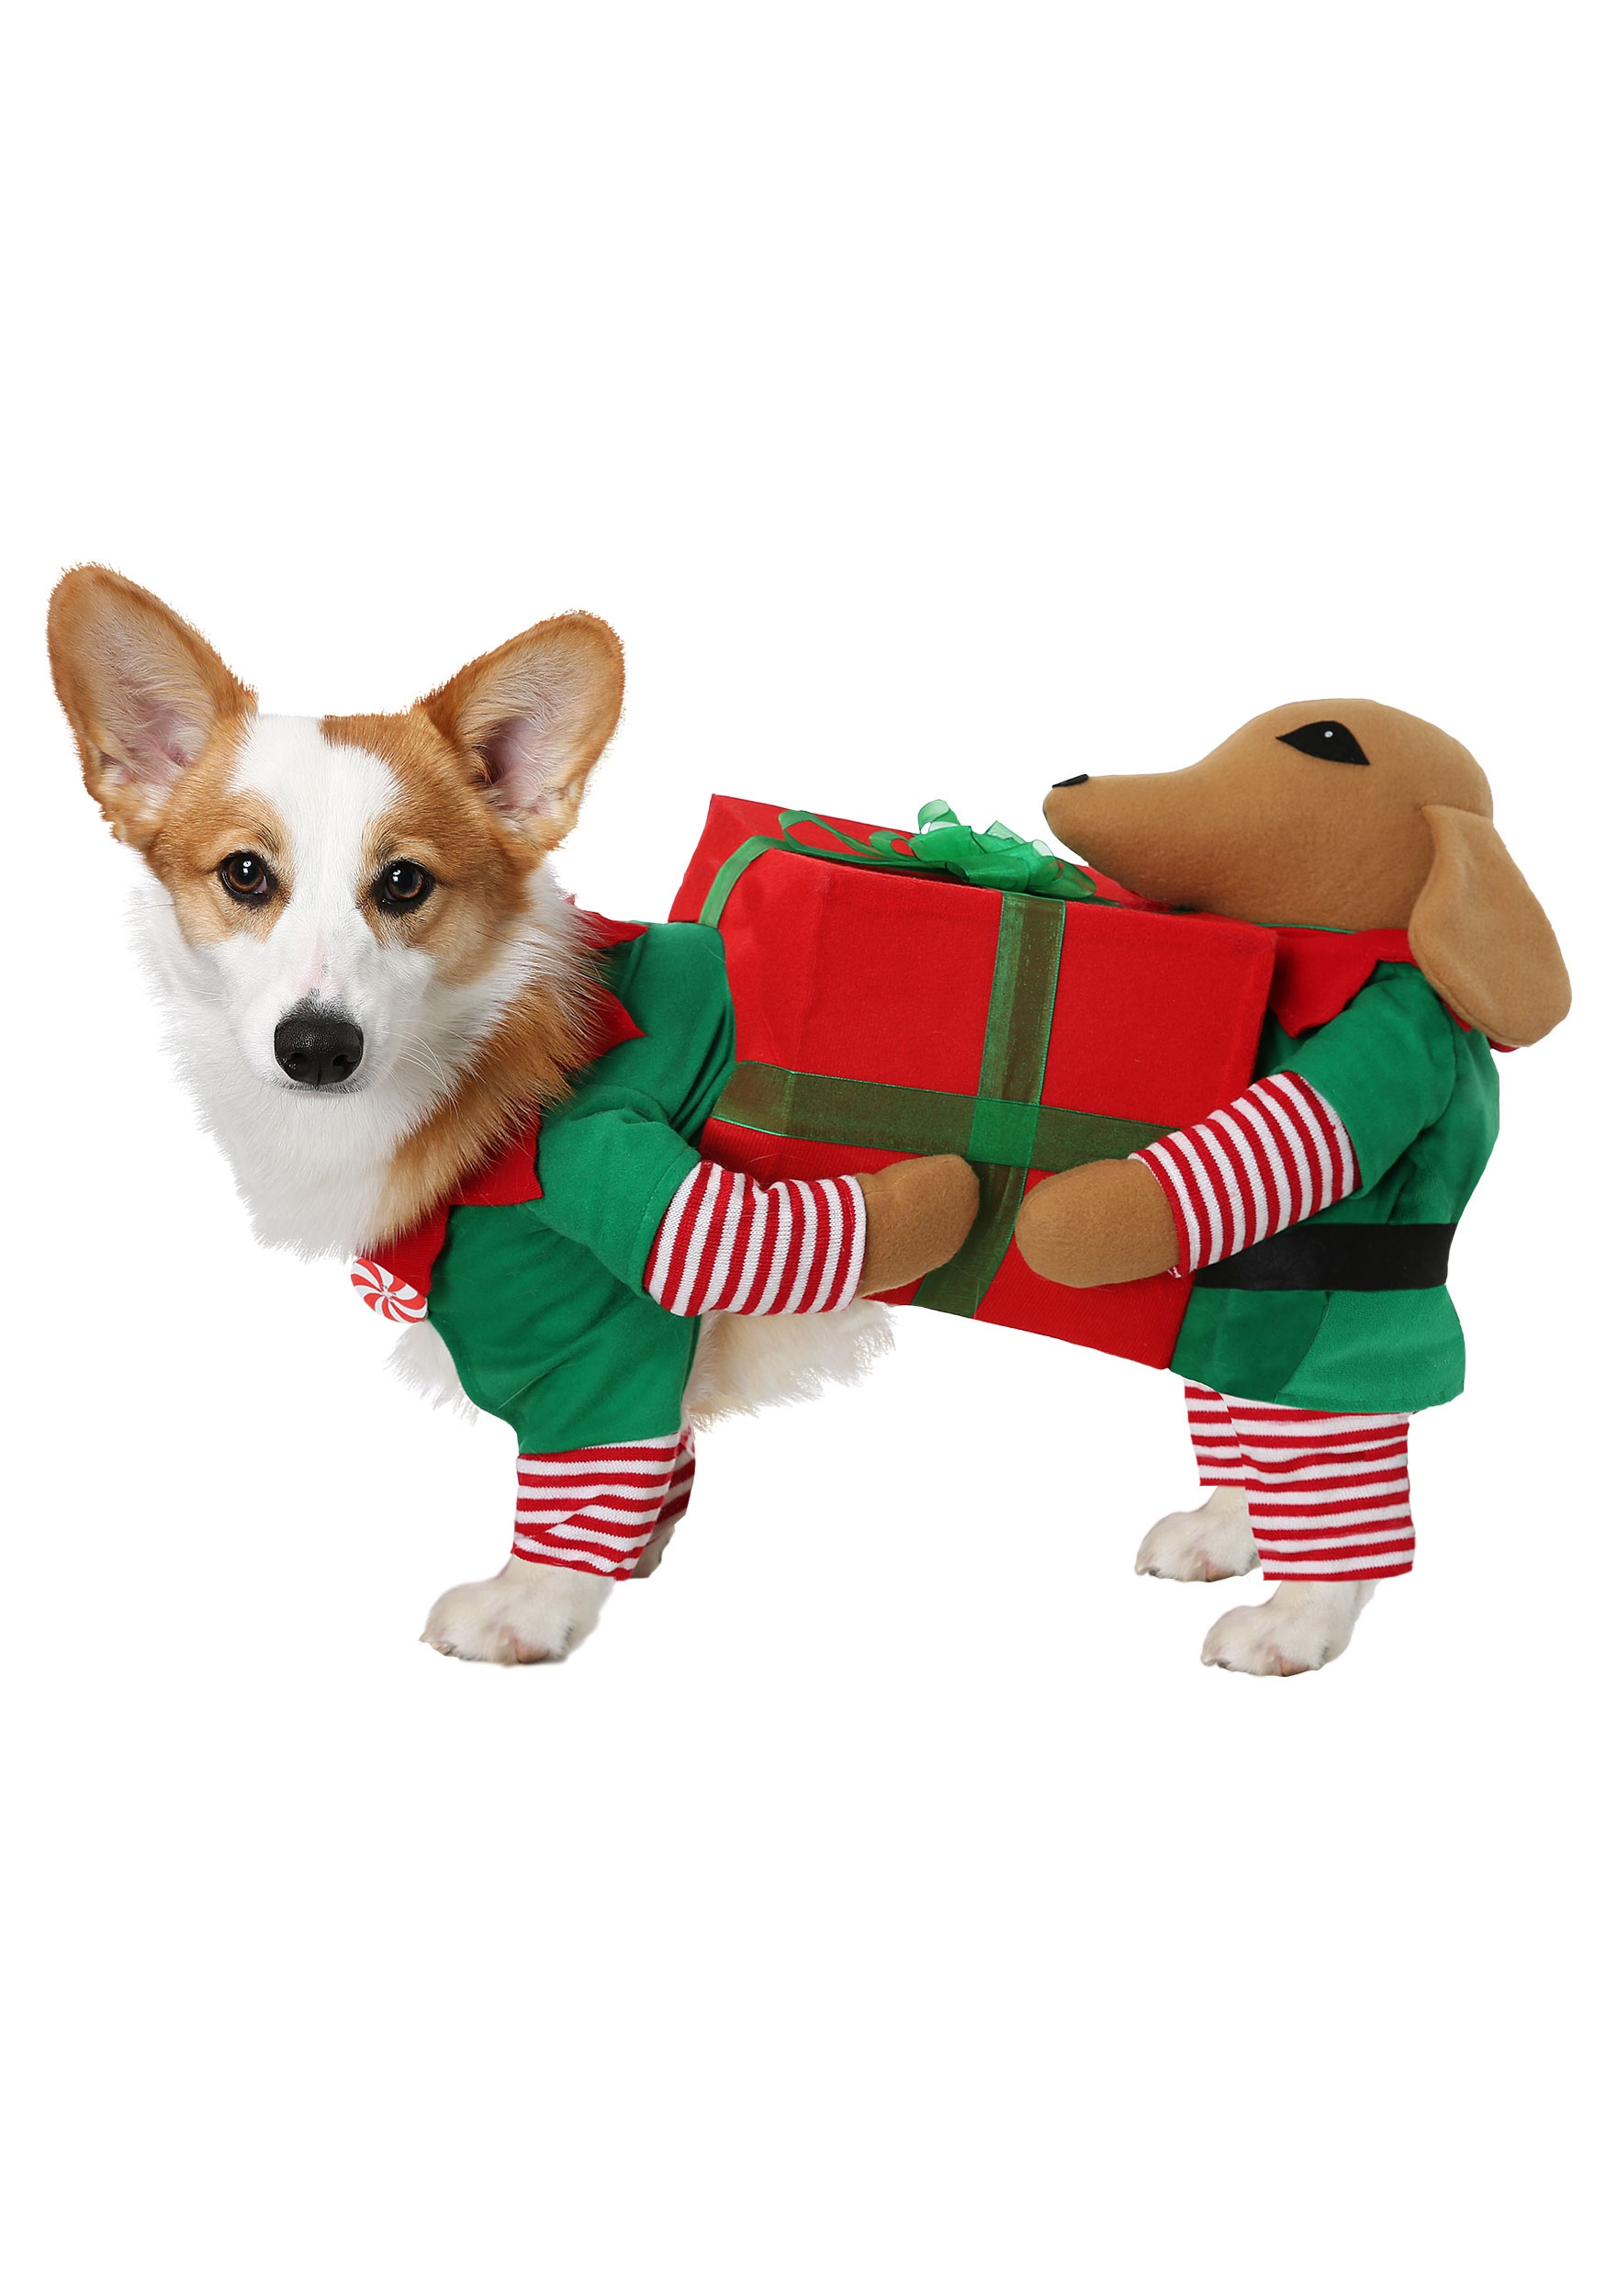 Charm Little Helper Dog Costume Results For Interests Pirates Little Helper Alternative baby Pirates Little Helper